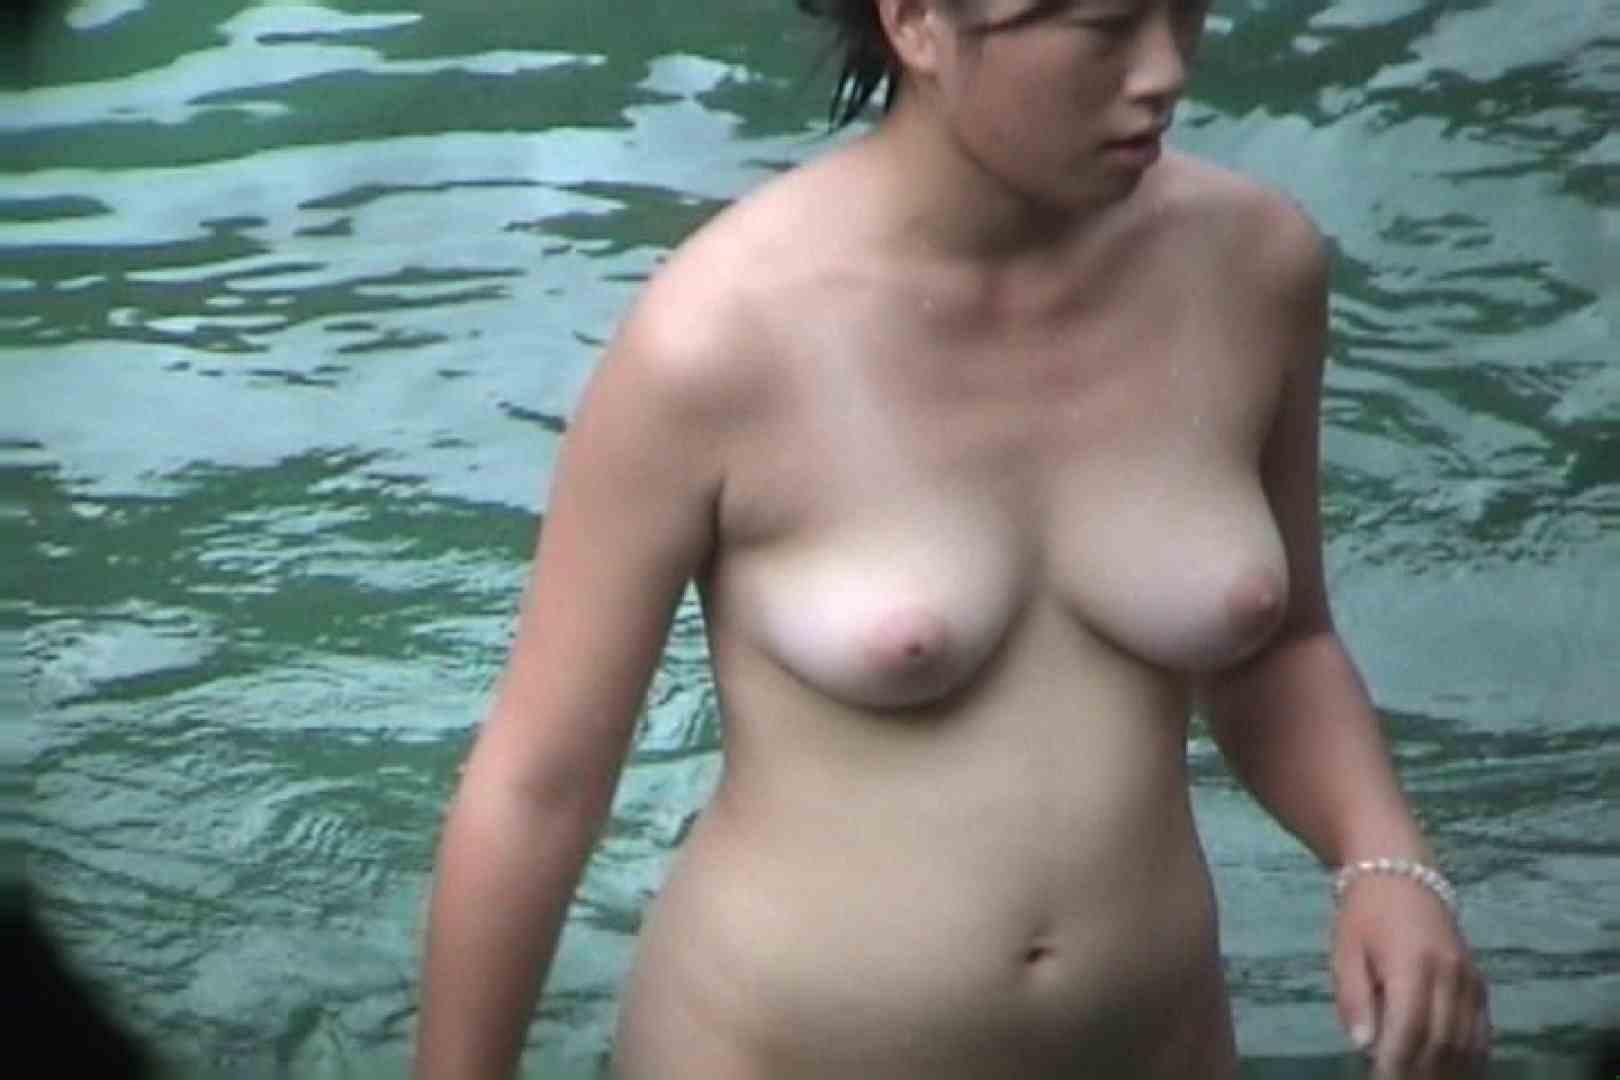 Aquaな露天風呂Vol.71【VIP限定】 エロいOL   露天覗き  74枚